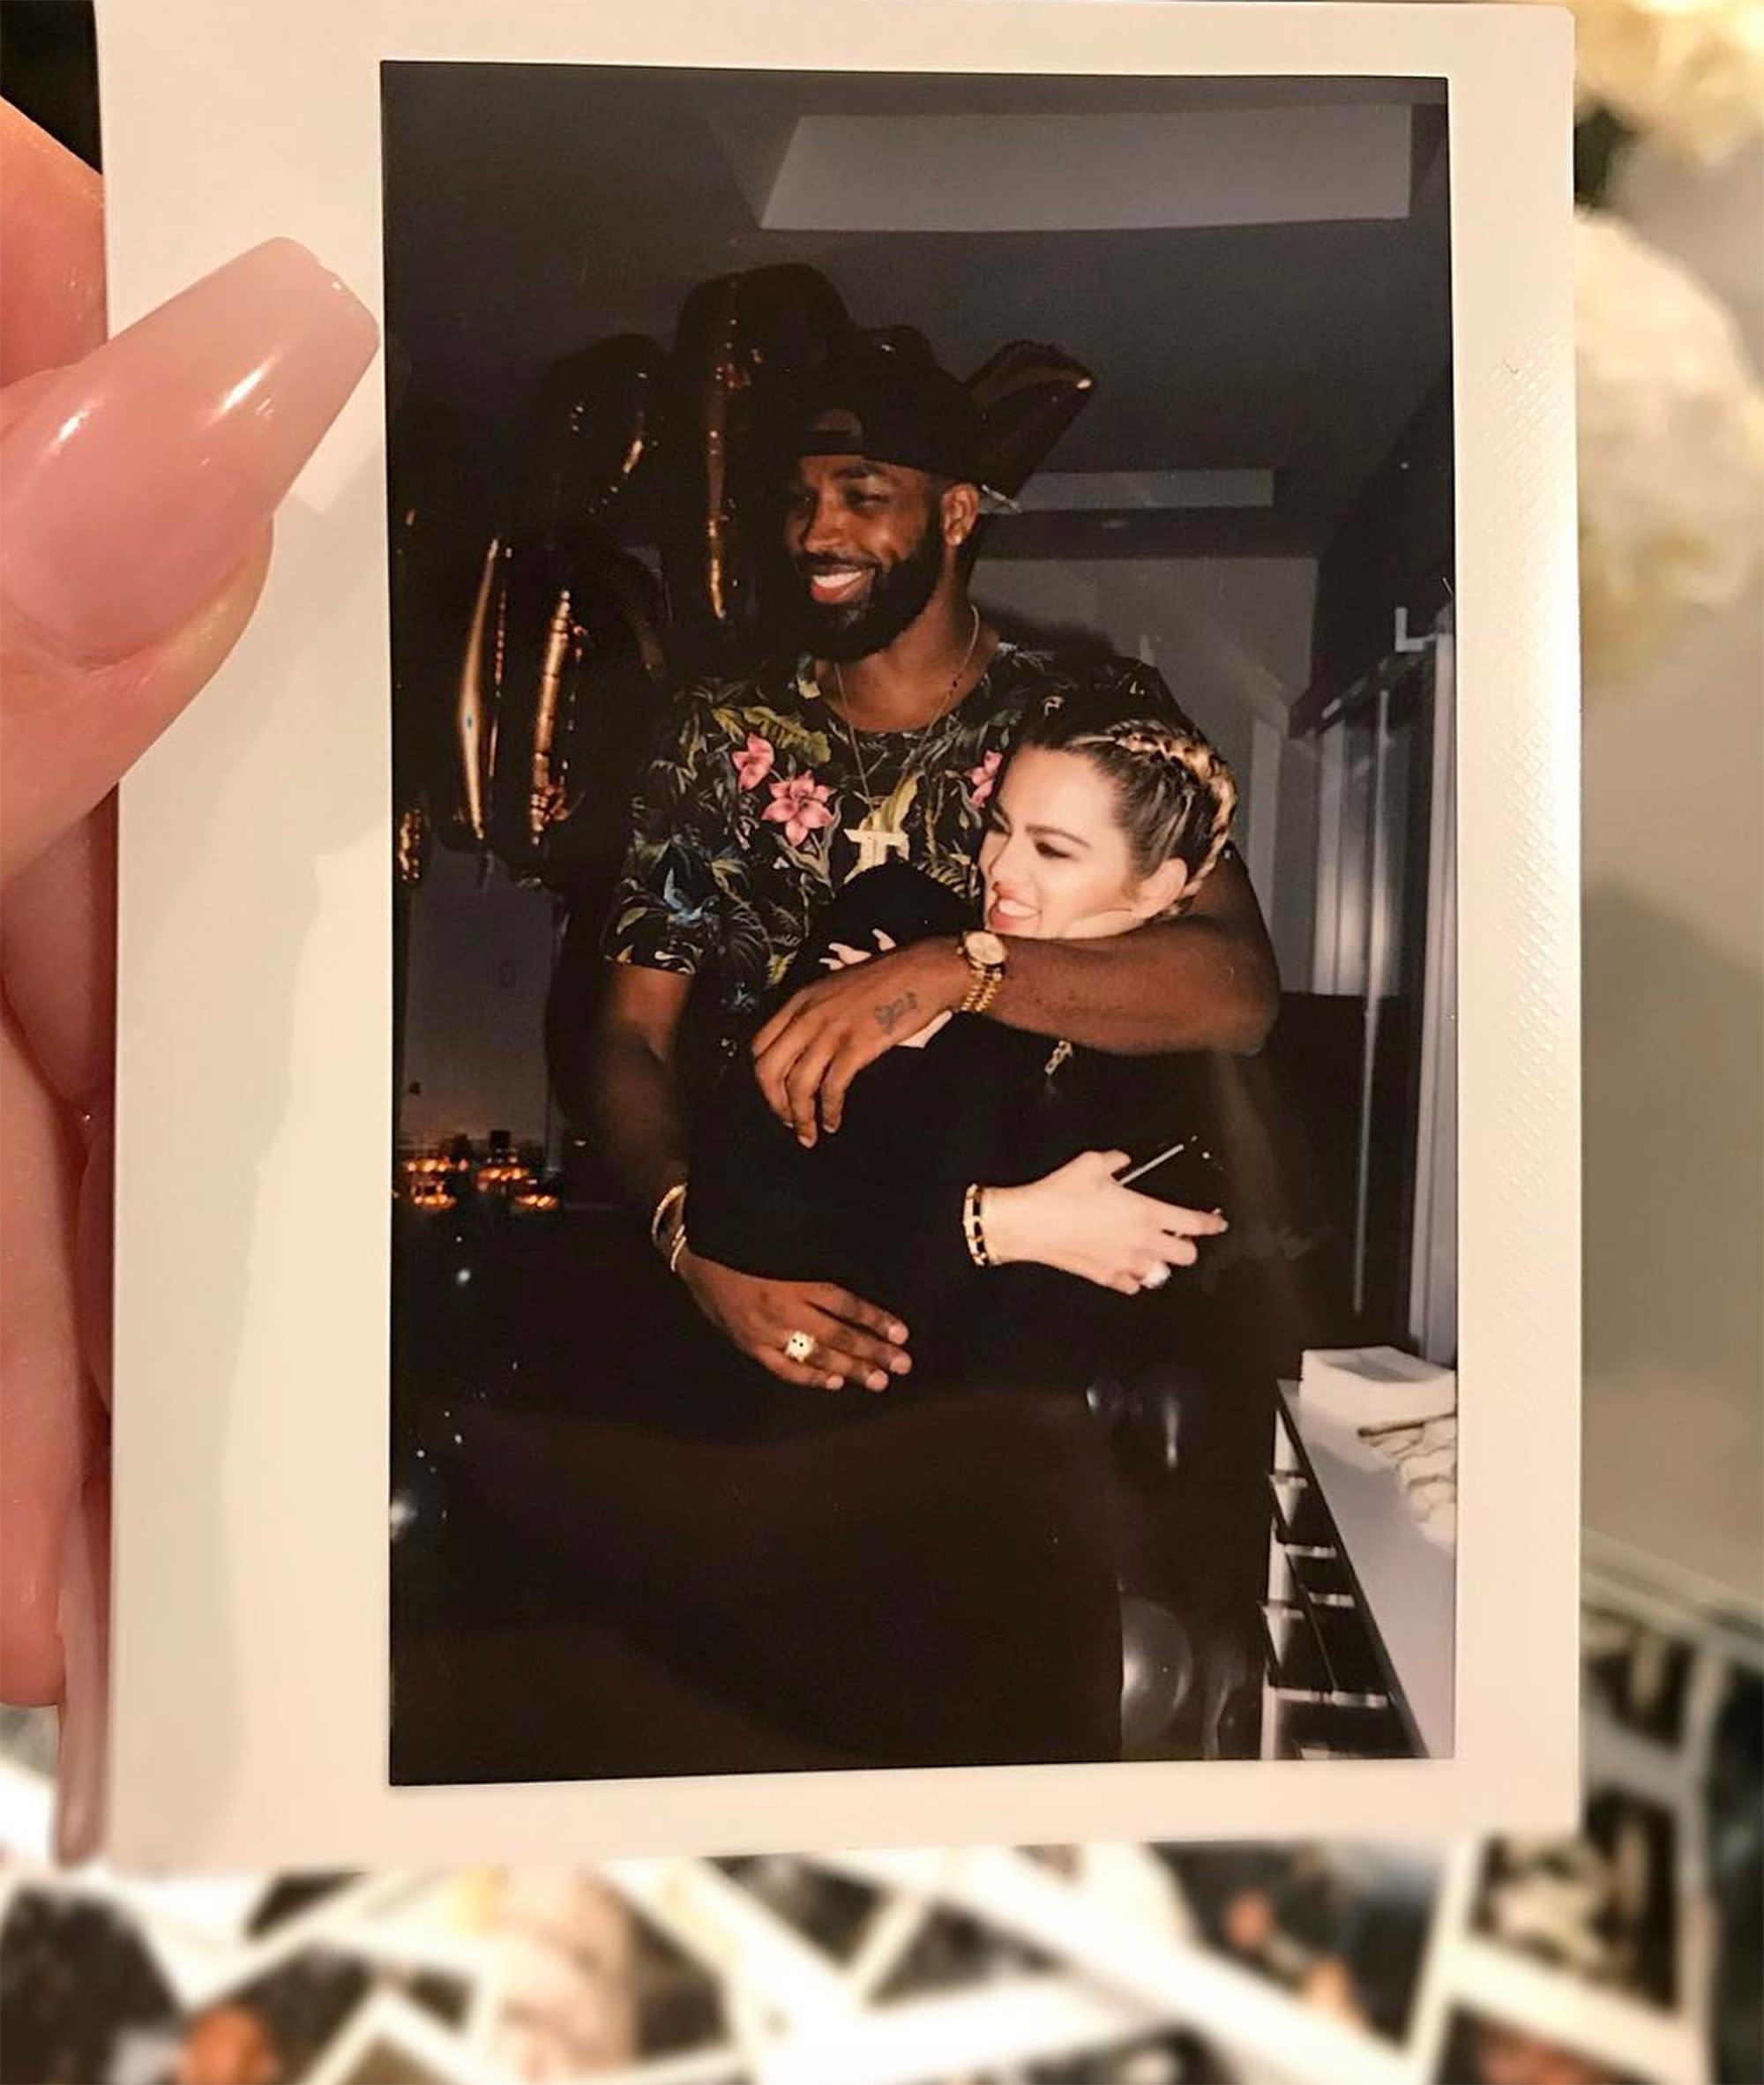 US\u0027: Khloé Kardashian Shares Adorable Polaroid with Beau Tristan ...